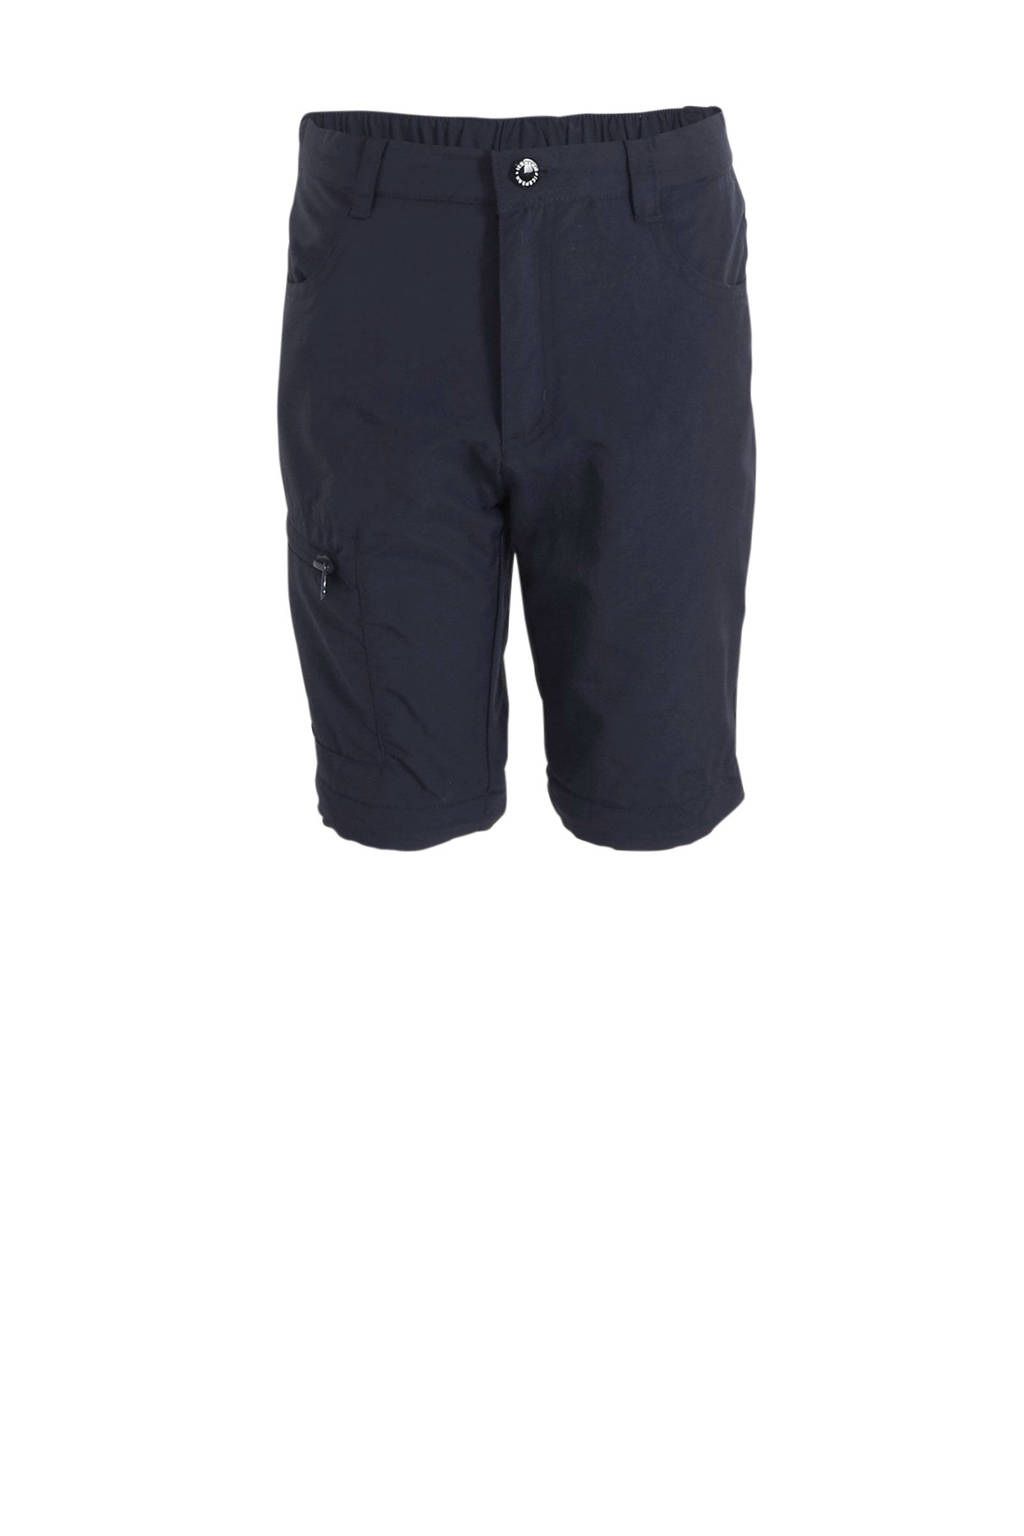 Icepeak jongens outdoor afritsbroek Kanpur Jr donkerblauw, Donkerblauw